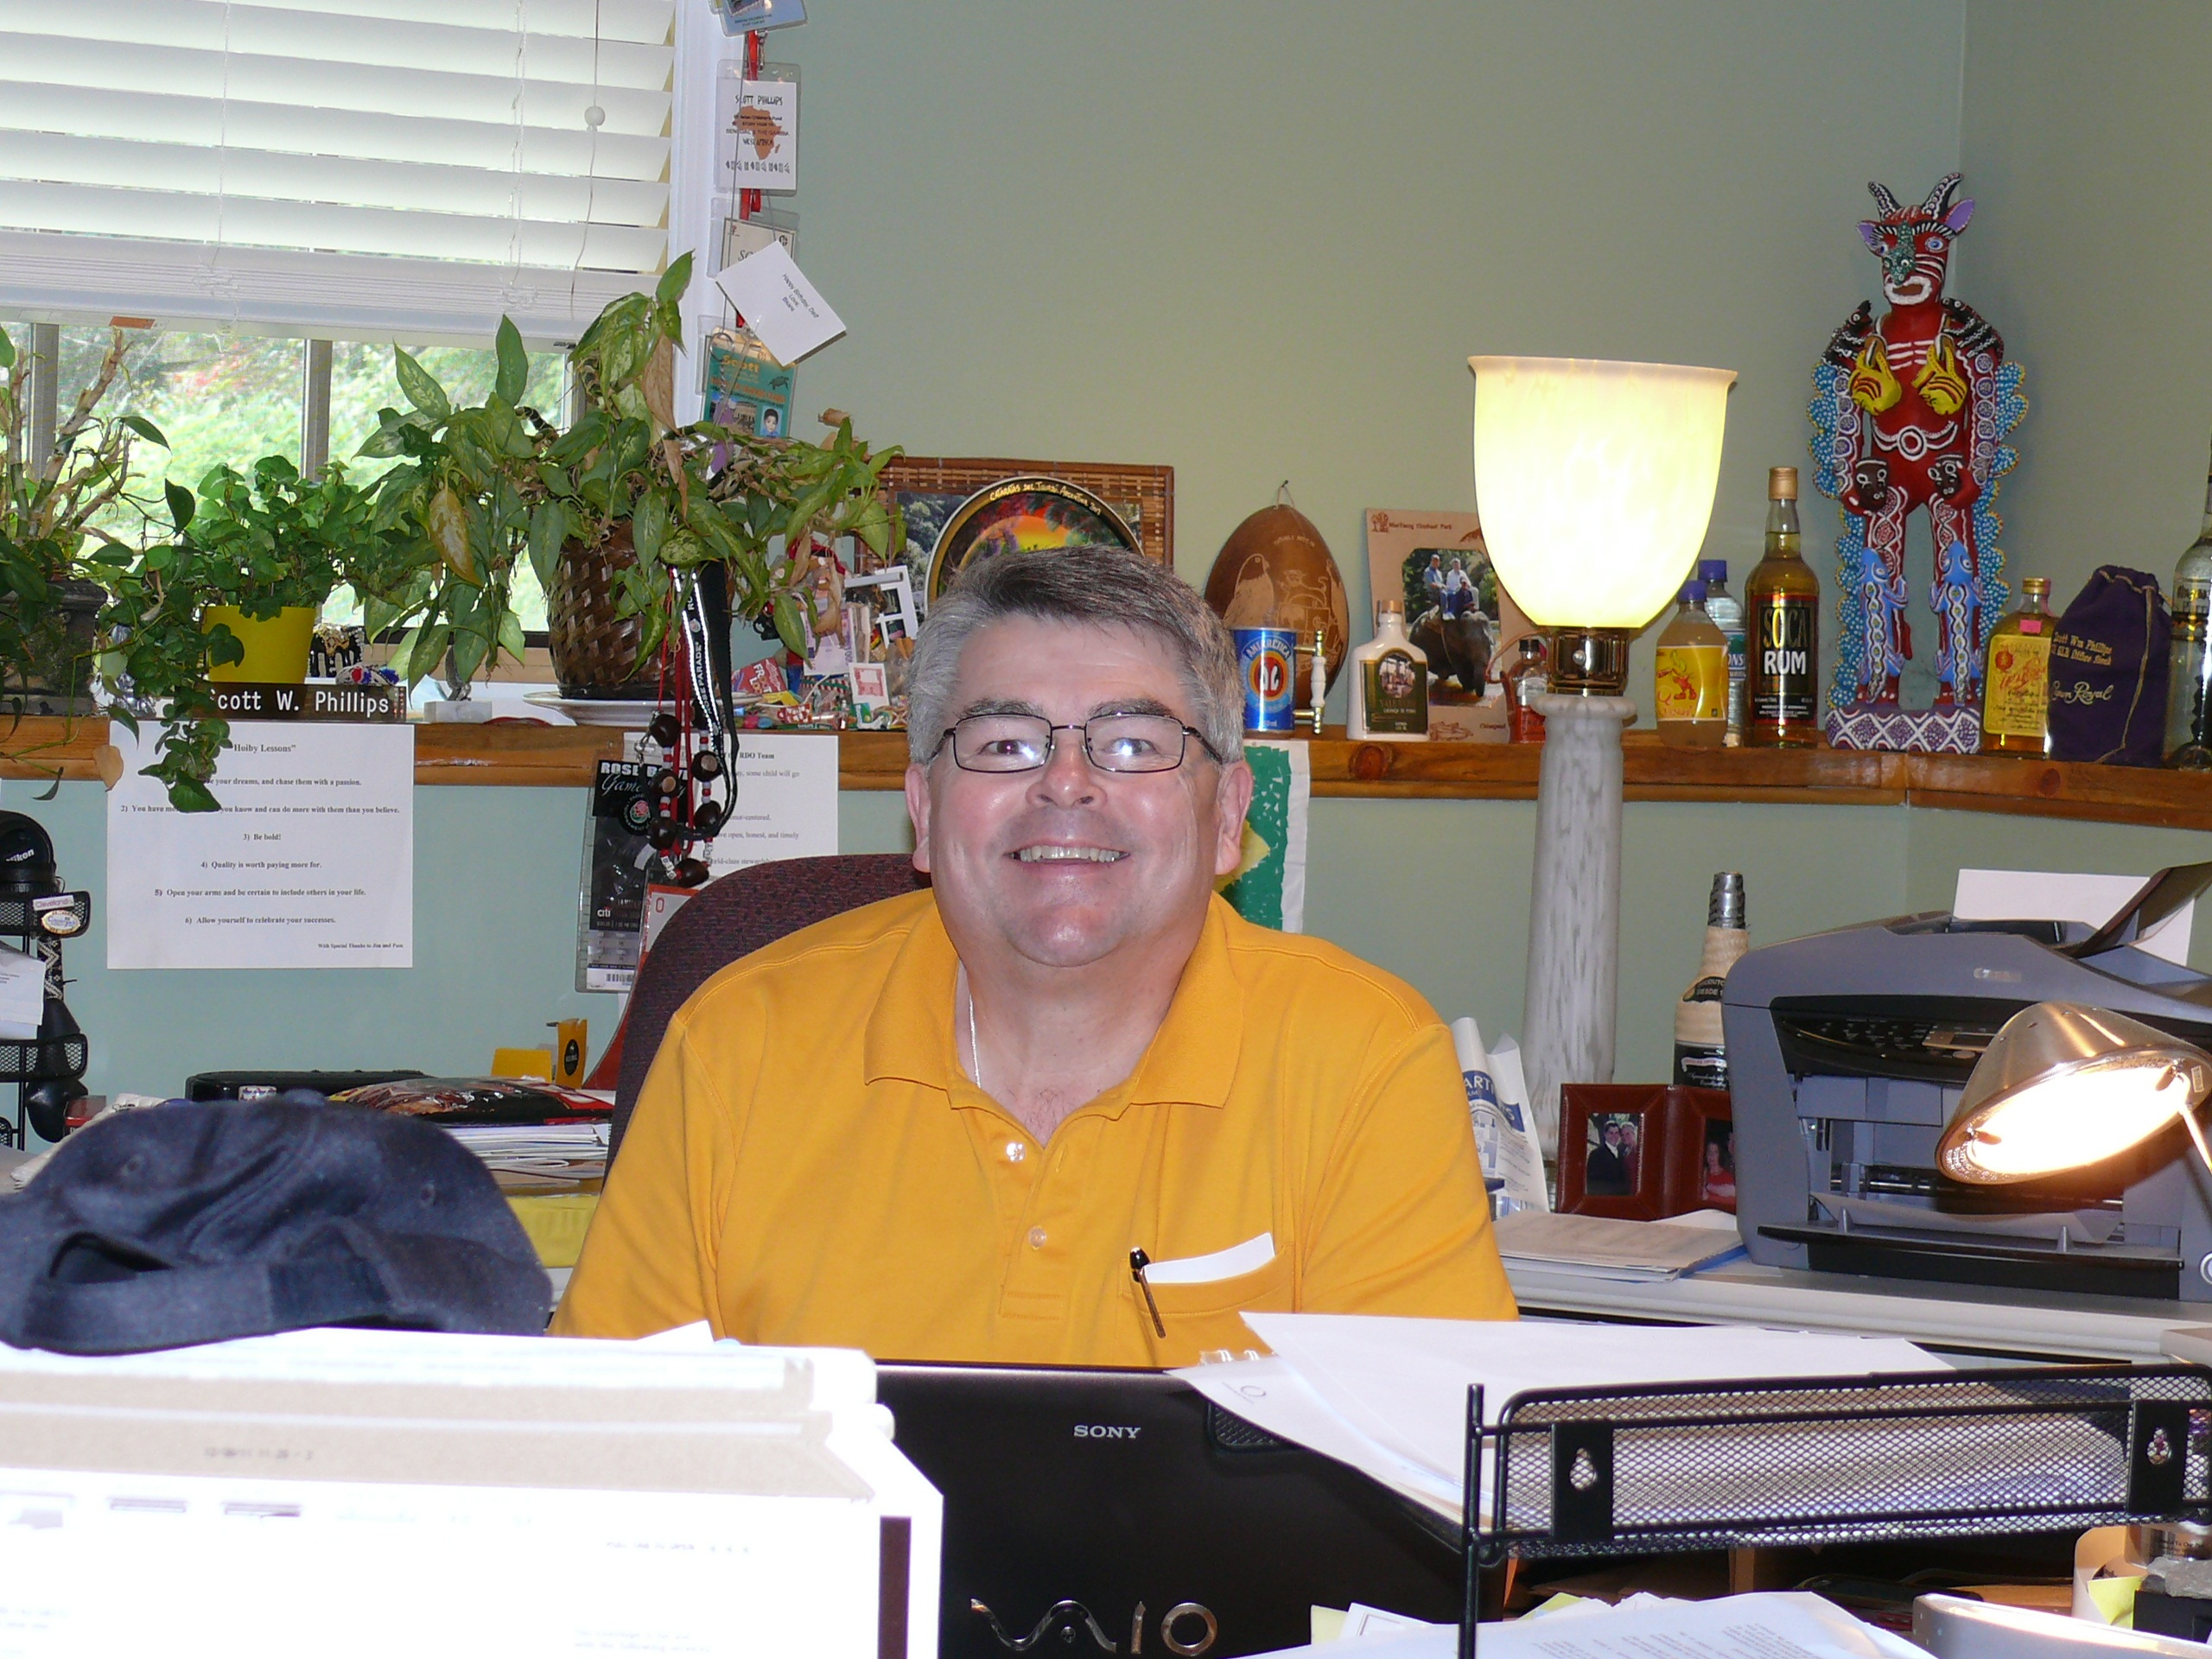 2013-02-28-Deskcloseup.jpg